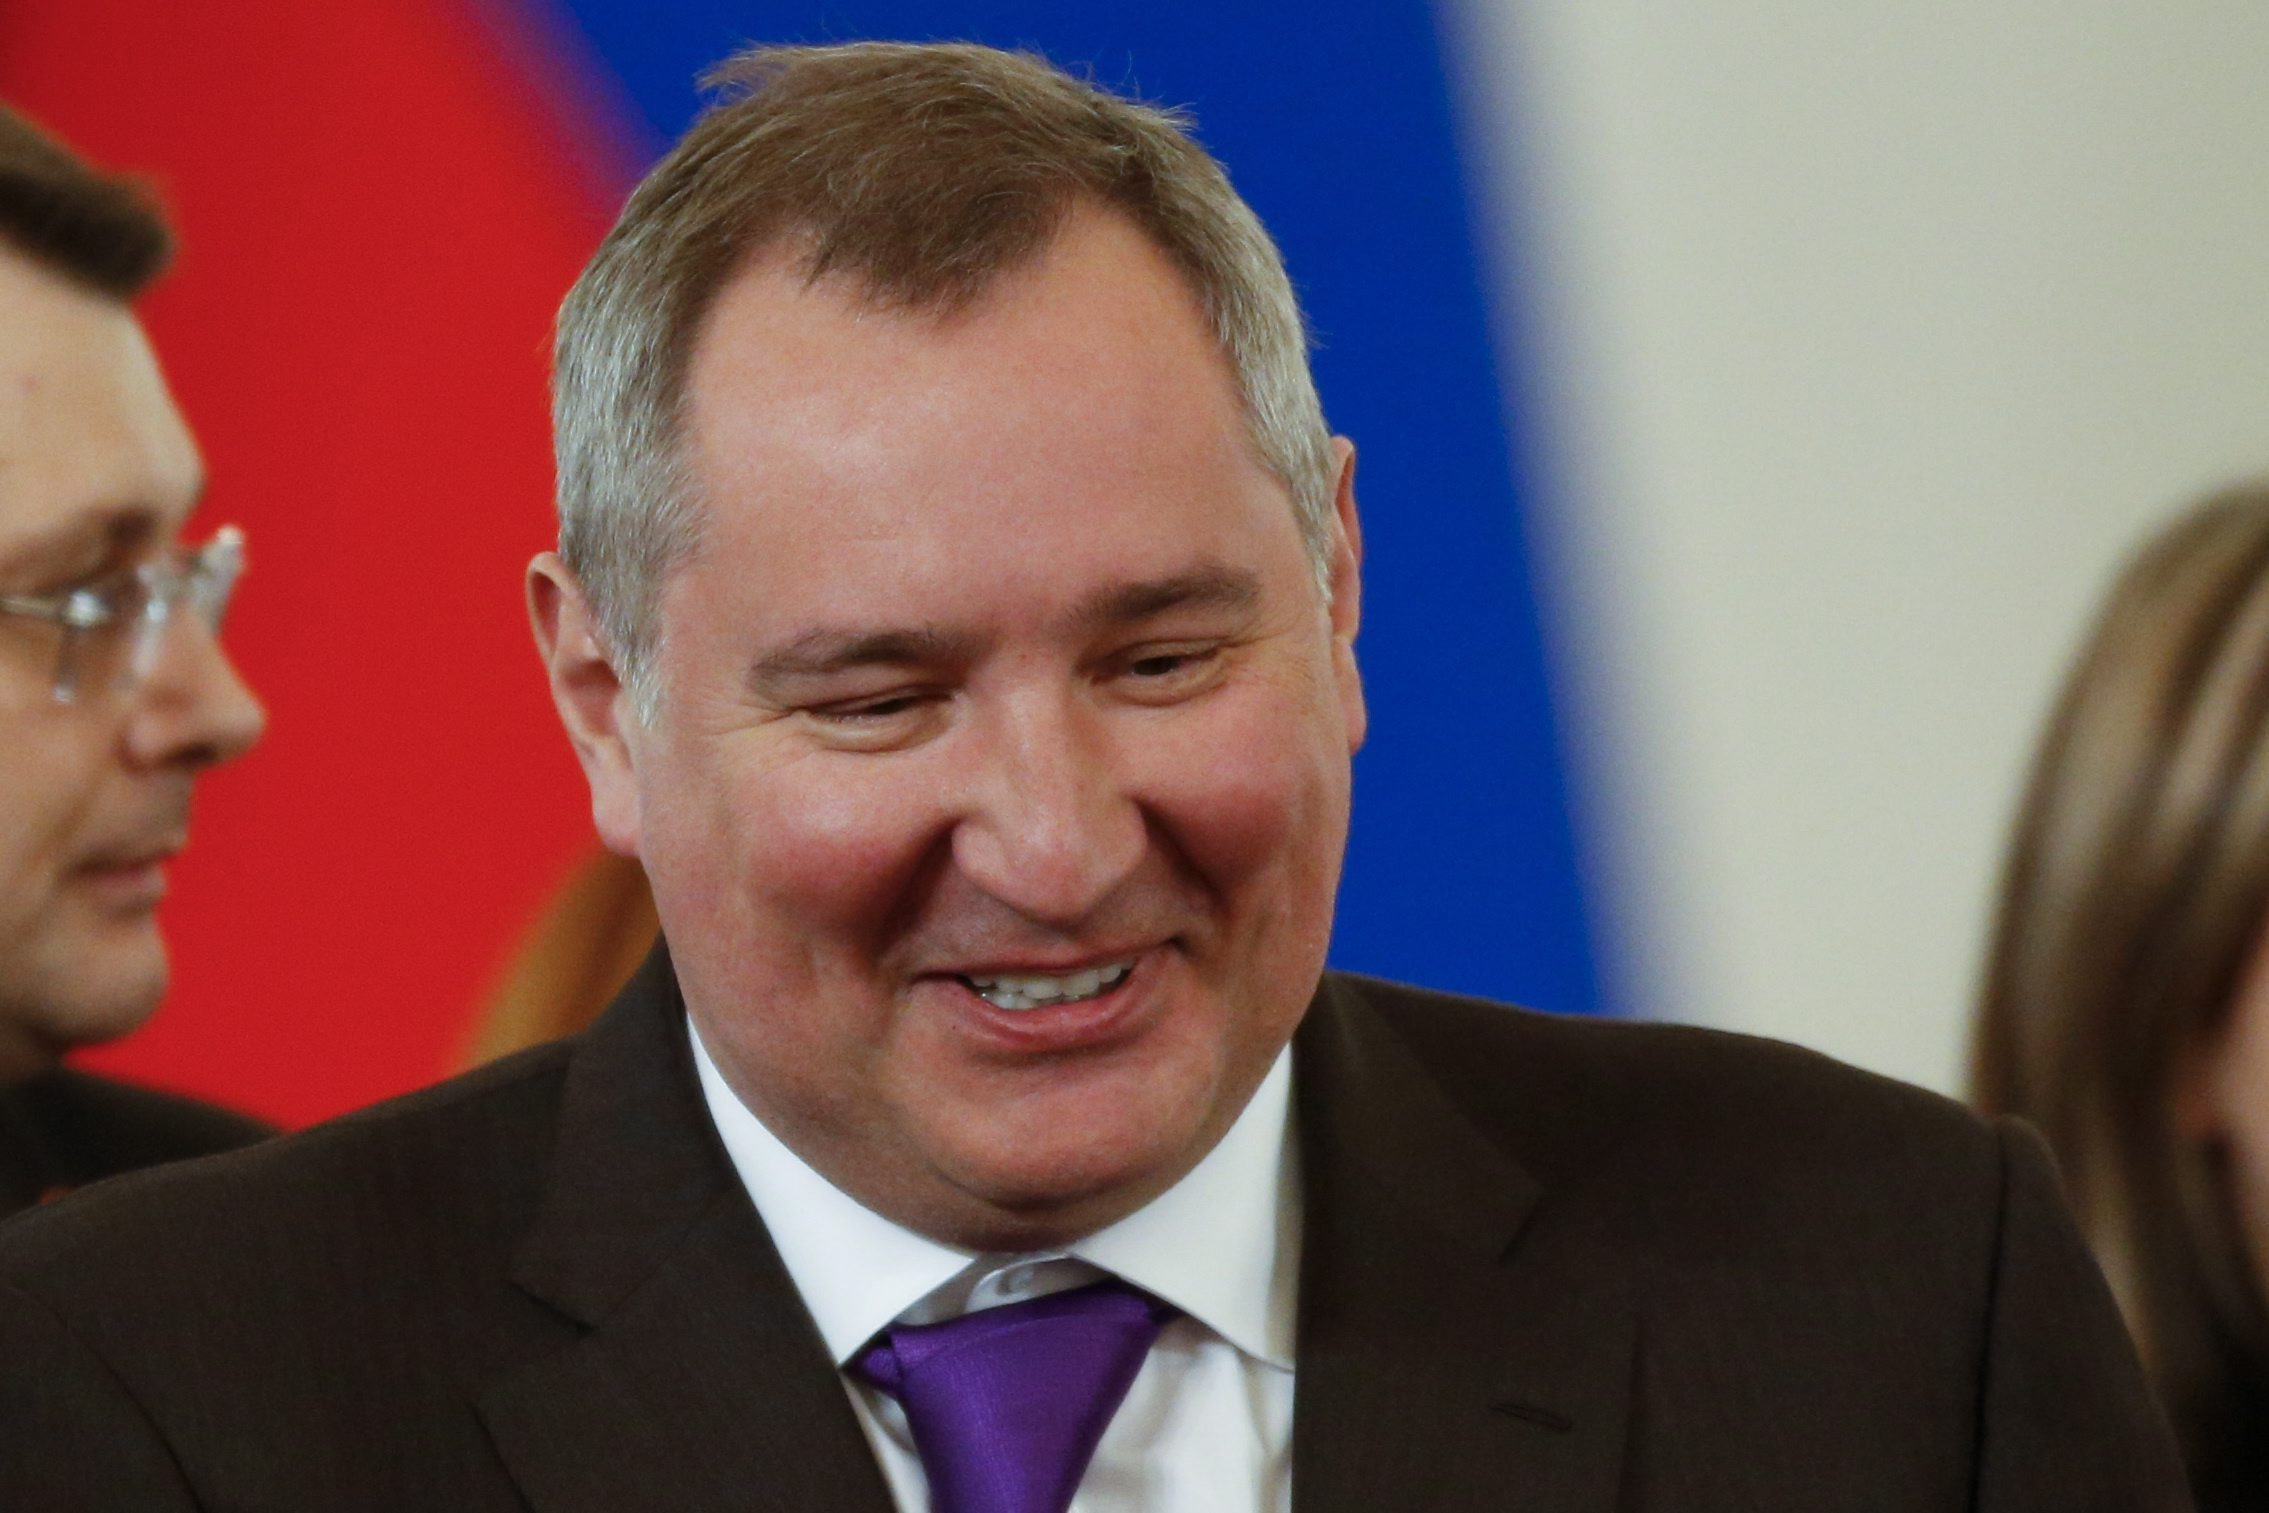 Dmitry Rogozin heads Russia's commission for Arctic affairs. (Alexander Zemlianichenko/AP)